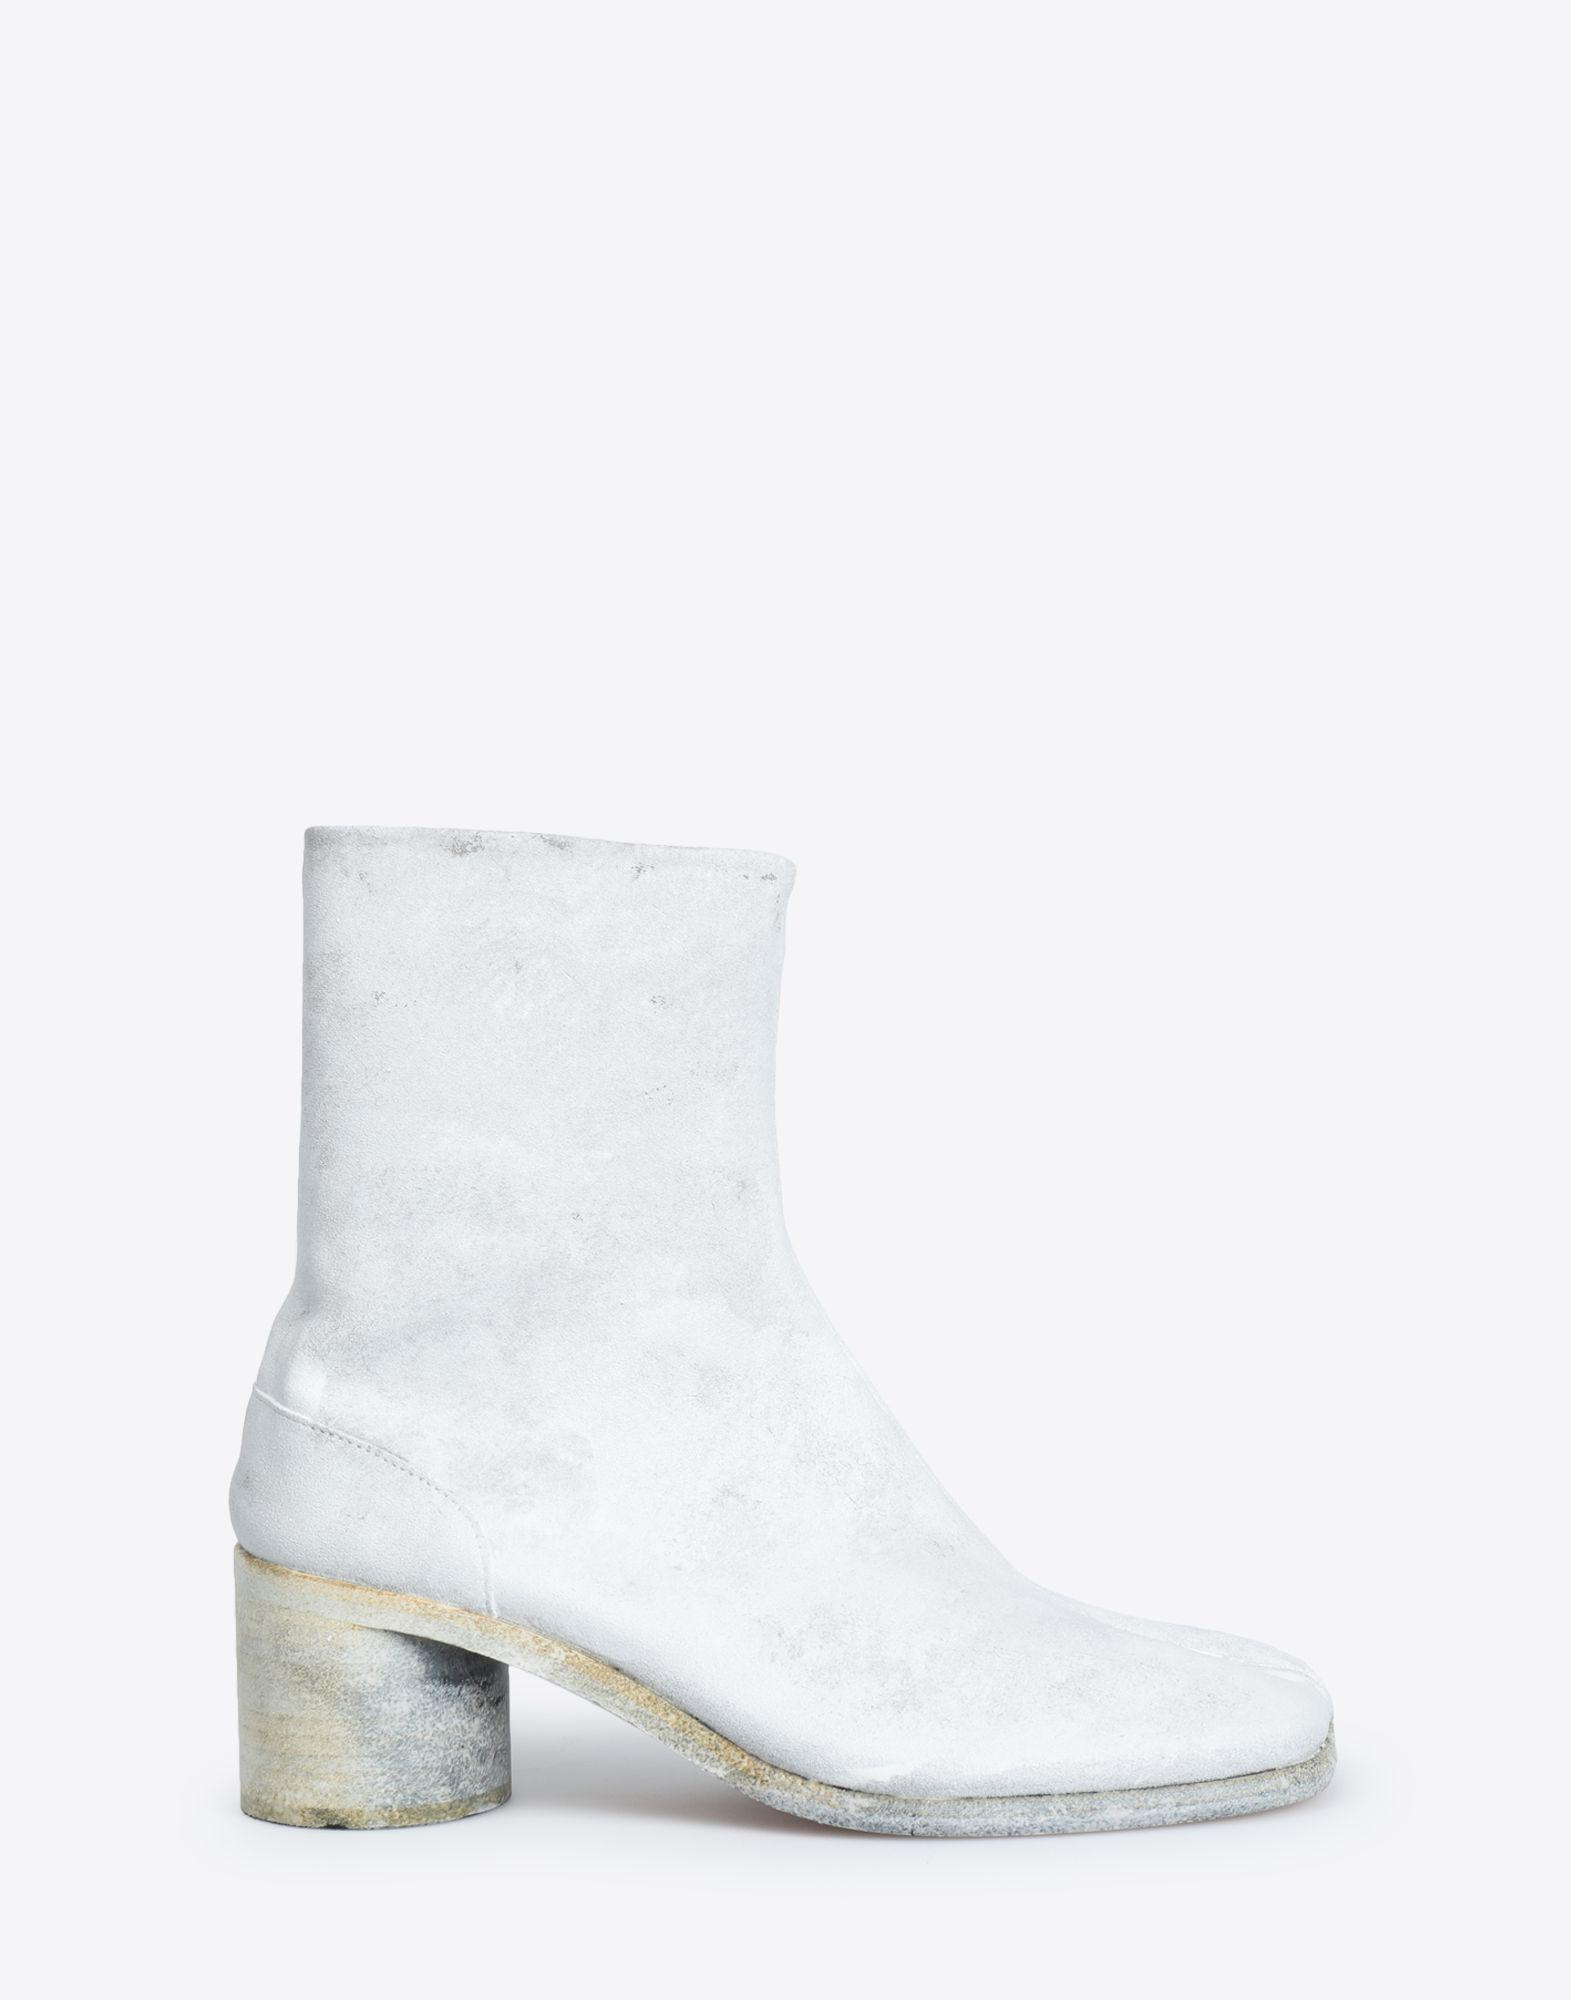 d270f57cf19ba8 ... White Painted Tabi Ankle Boots for men. Visit Maison Margiela. Tap to  visit site